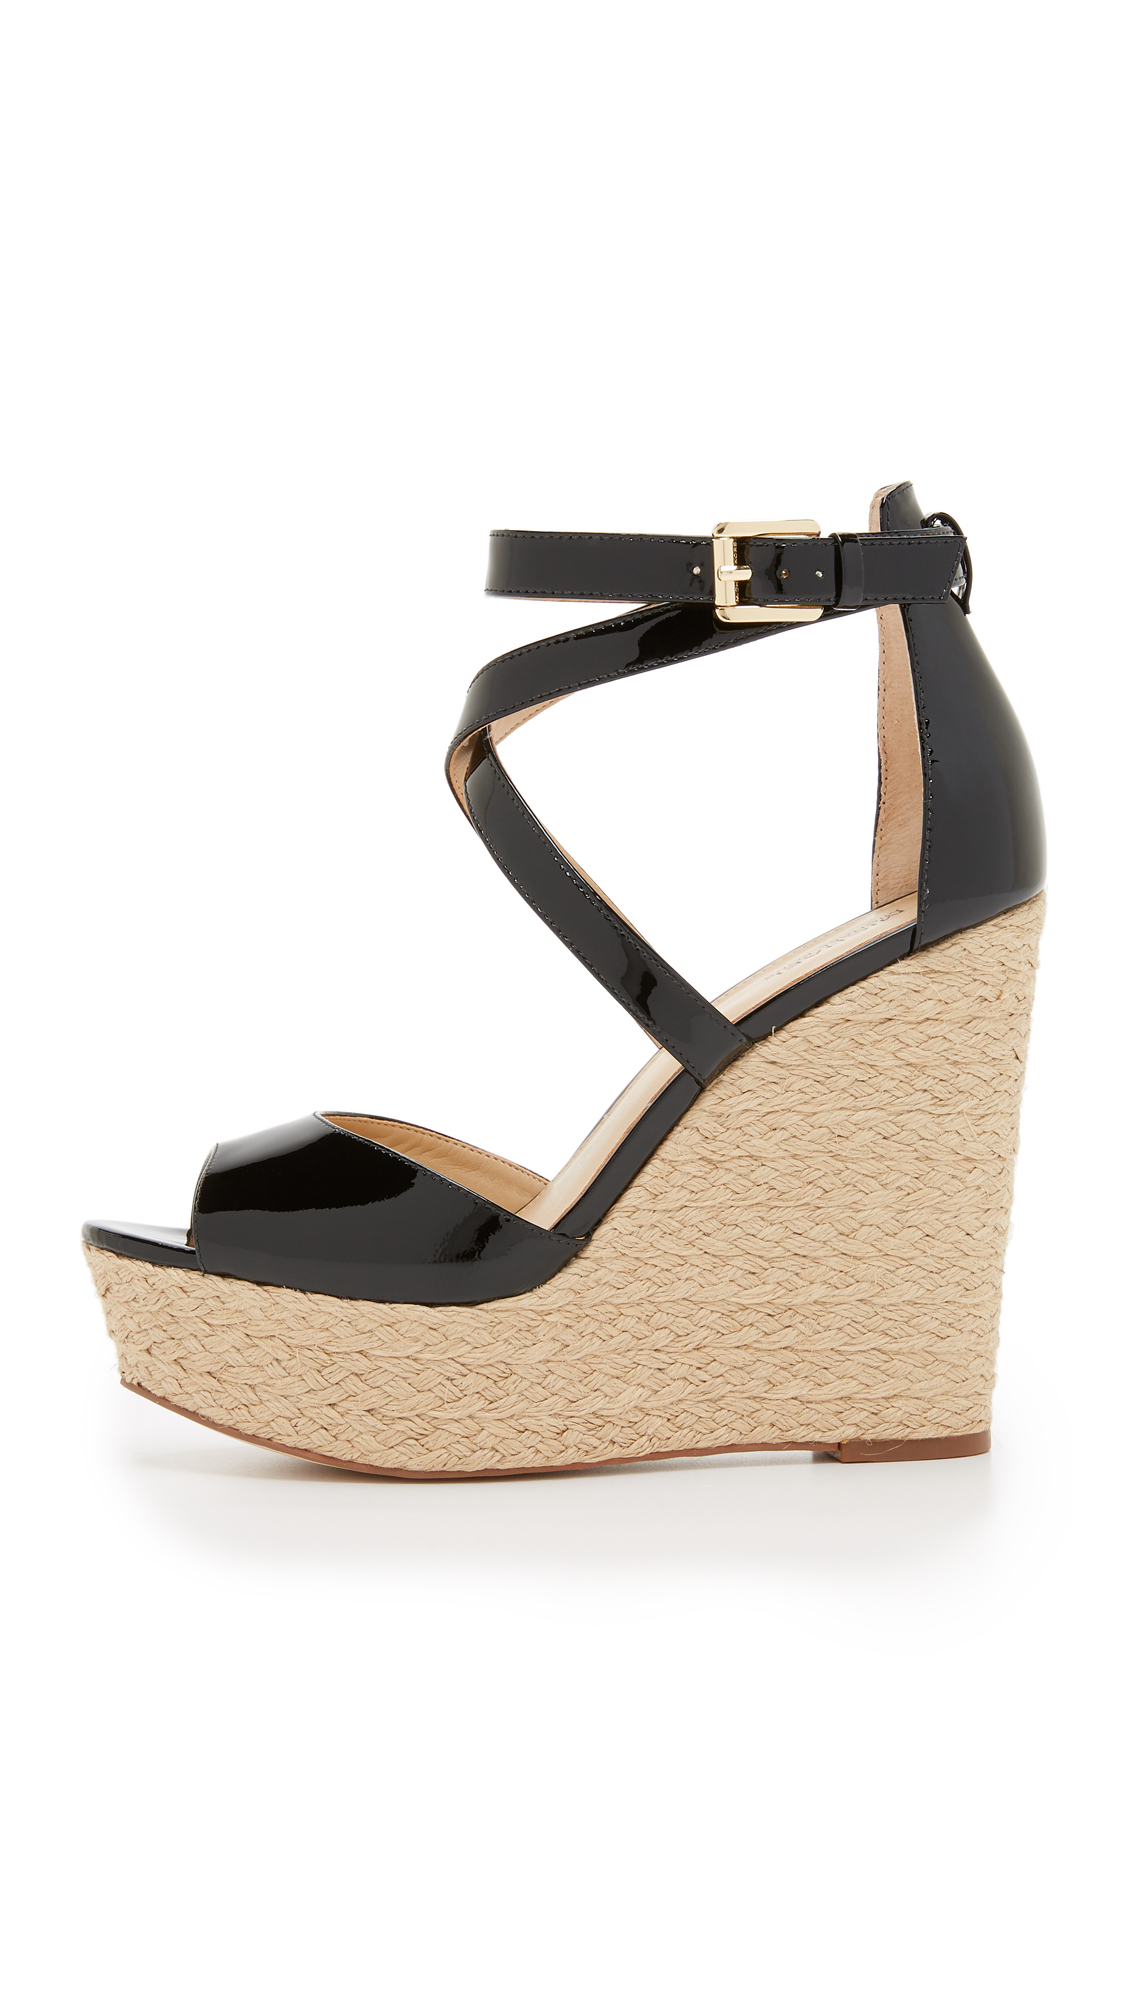 Black sandals michael kors - Black Sandals Michael Kors 43